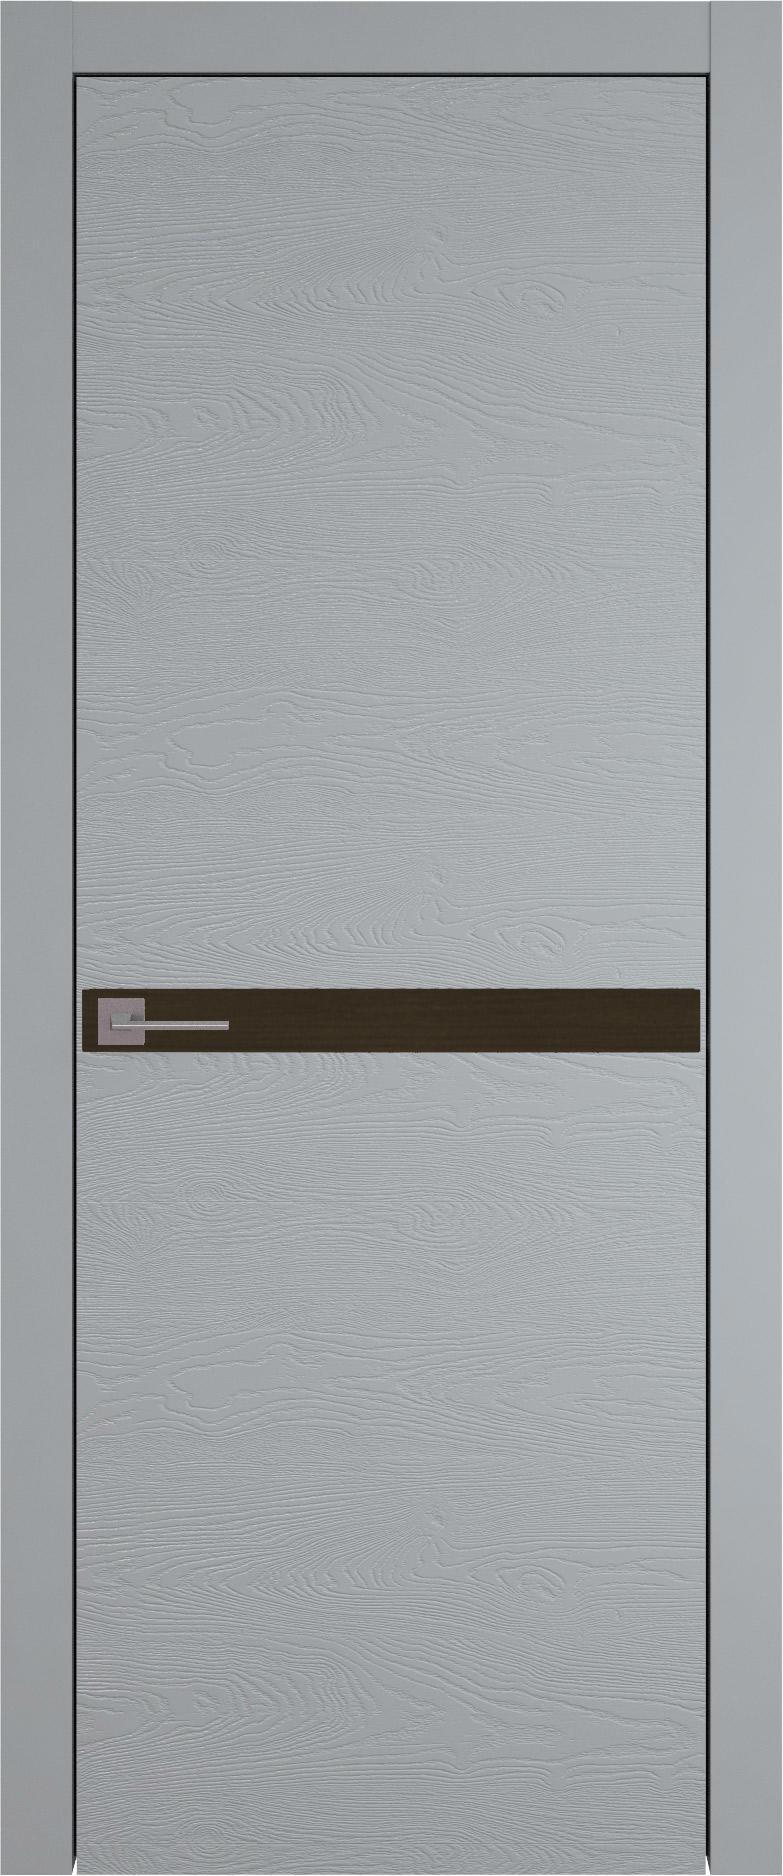 Tivoli Б-4 цвет - Серебристо-серая эмаль по шпону (RAL 7045) Без стекла (ДГ)